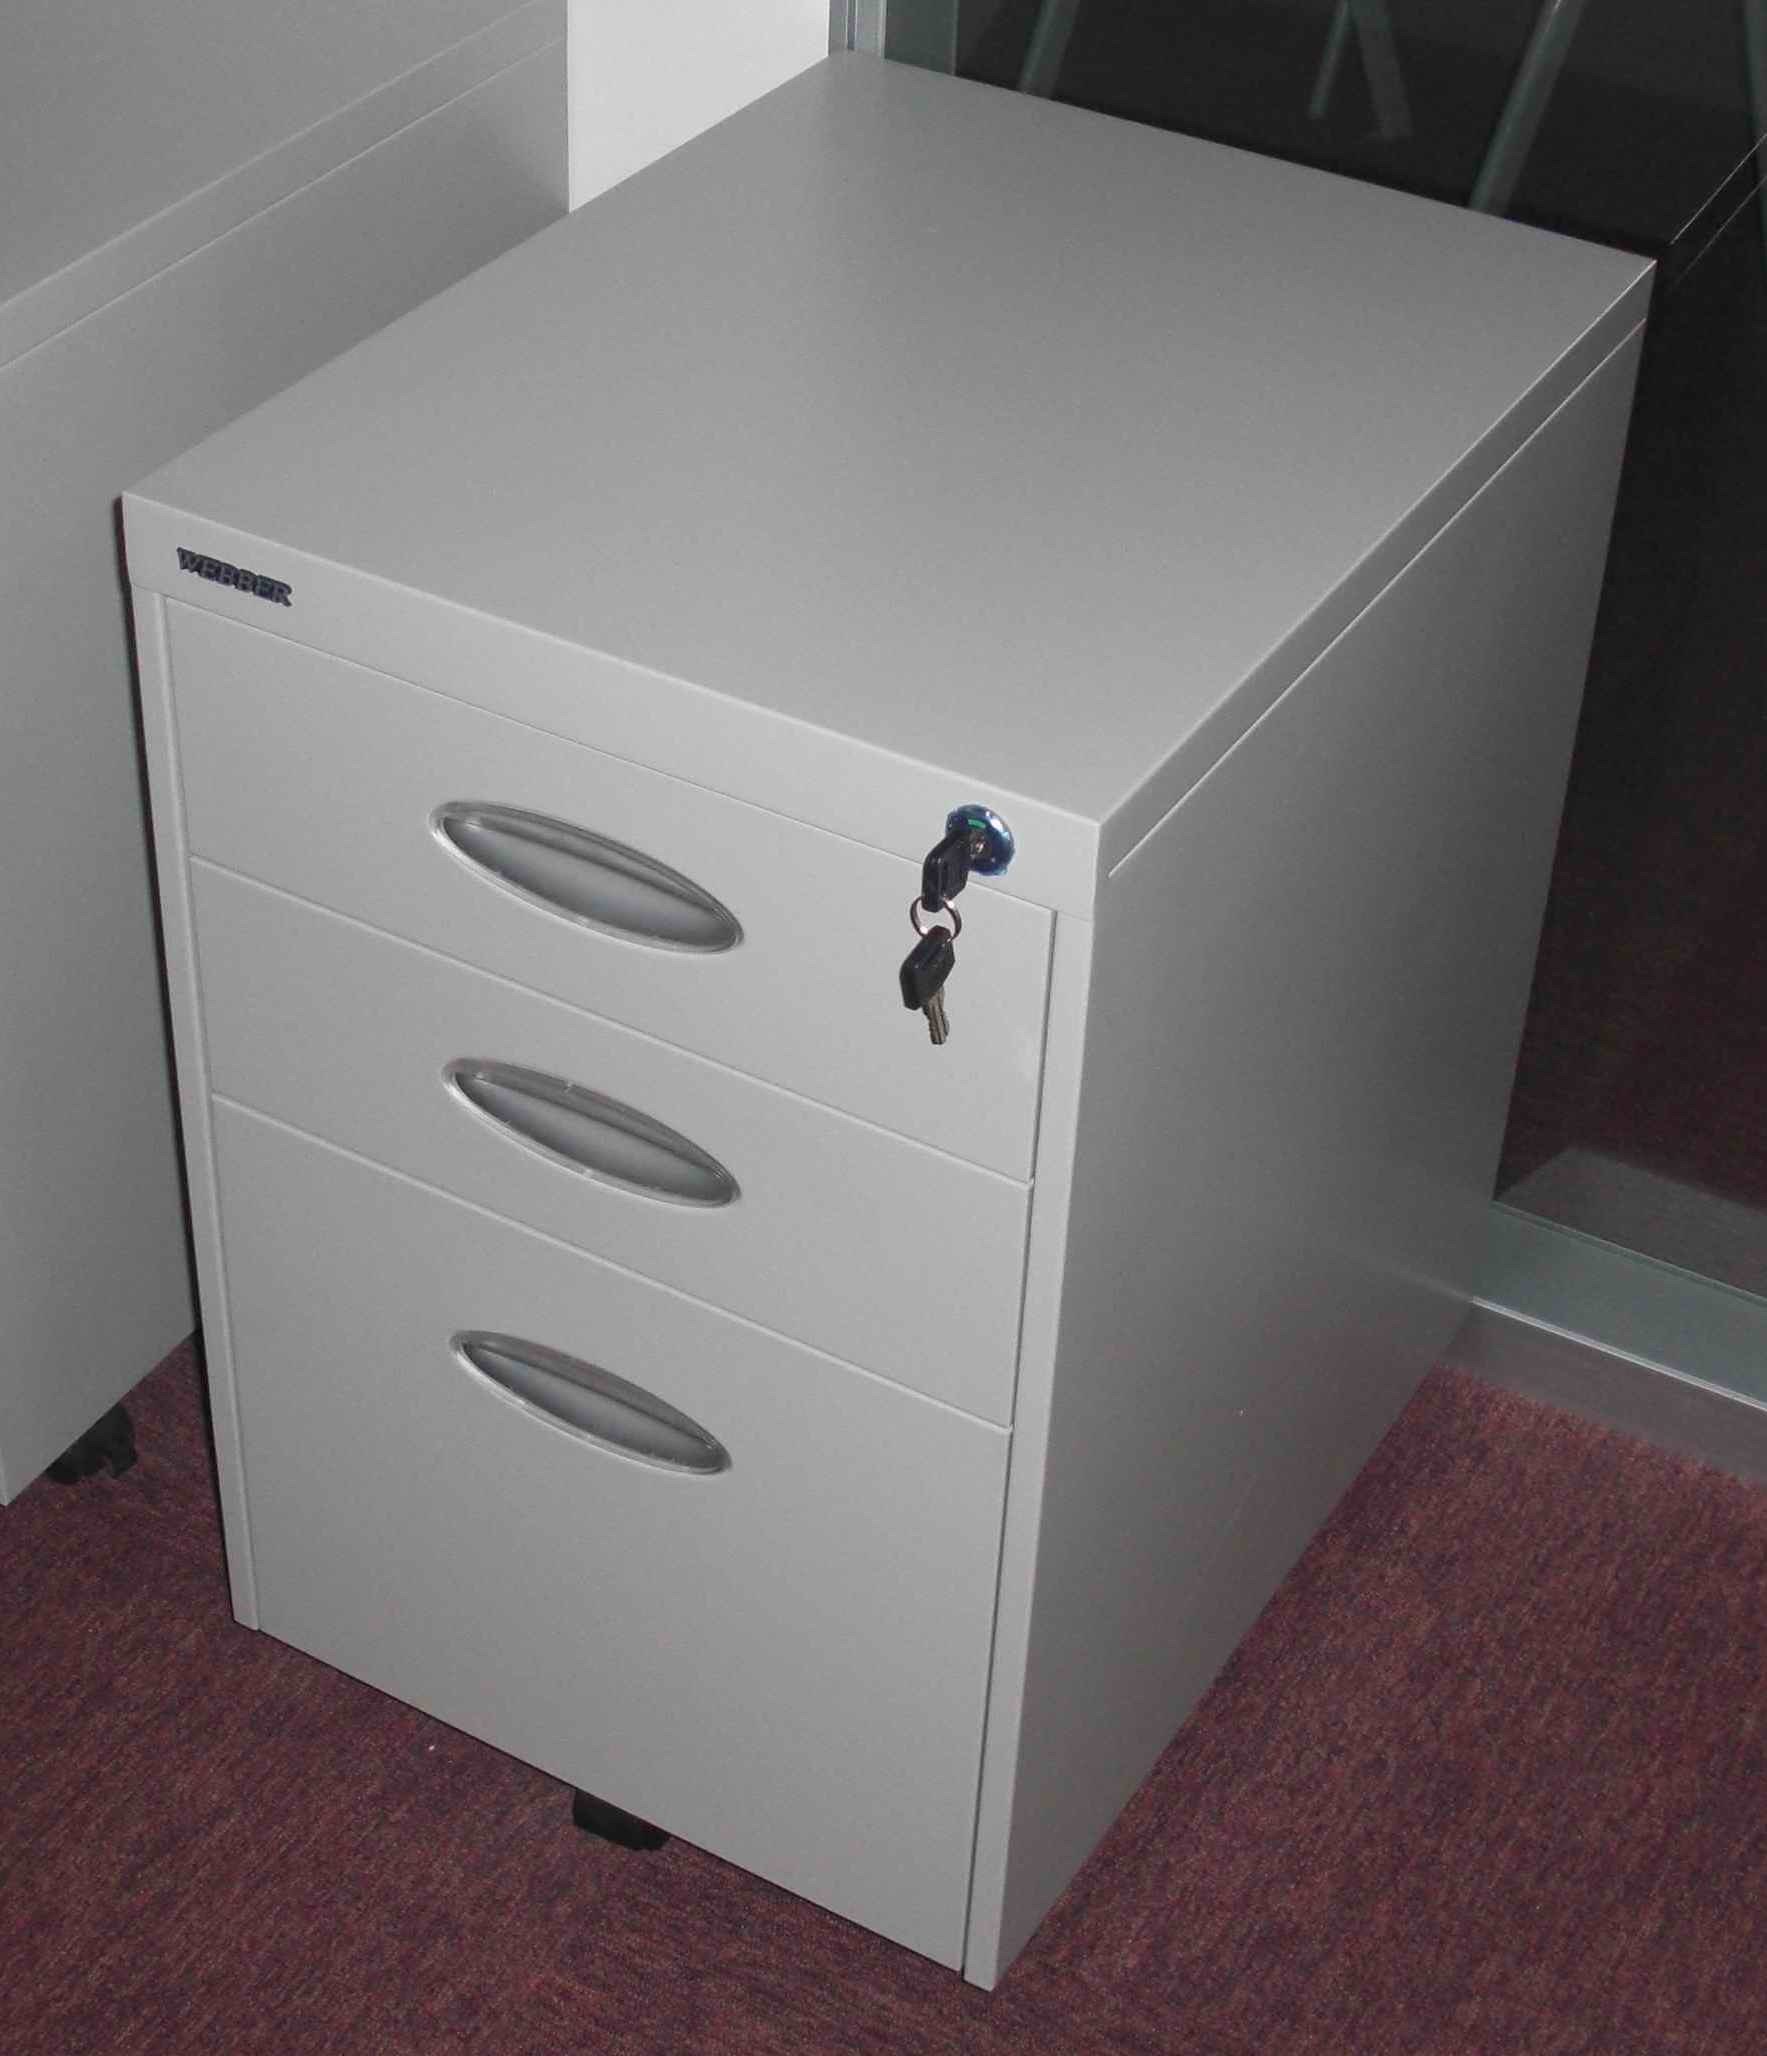 bureau mobile pedestal avec oval door plastic handle m3d bureau mobile pedestal avec oval. Black Bedroom Furniture Sets. Home Design Ideas